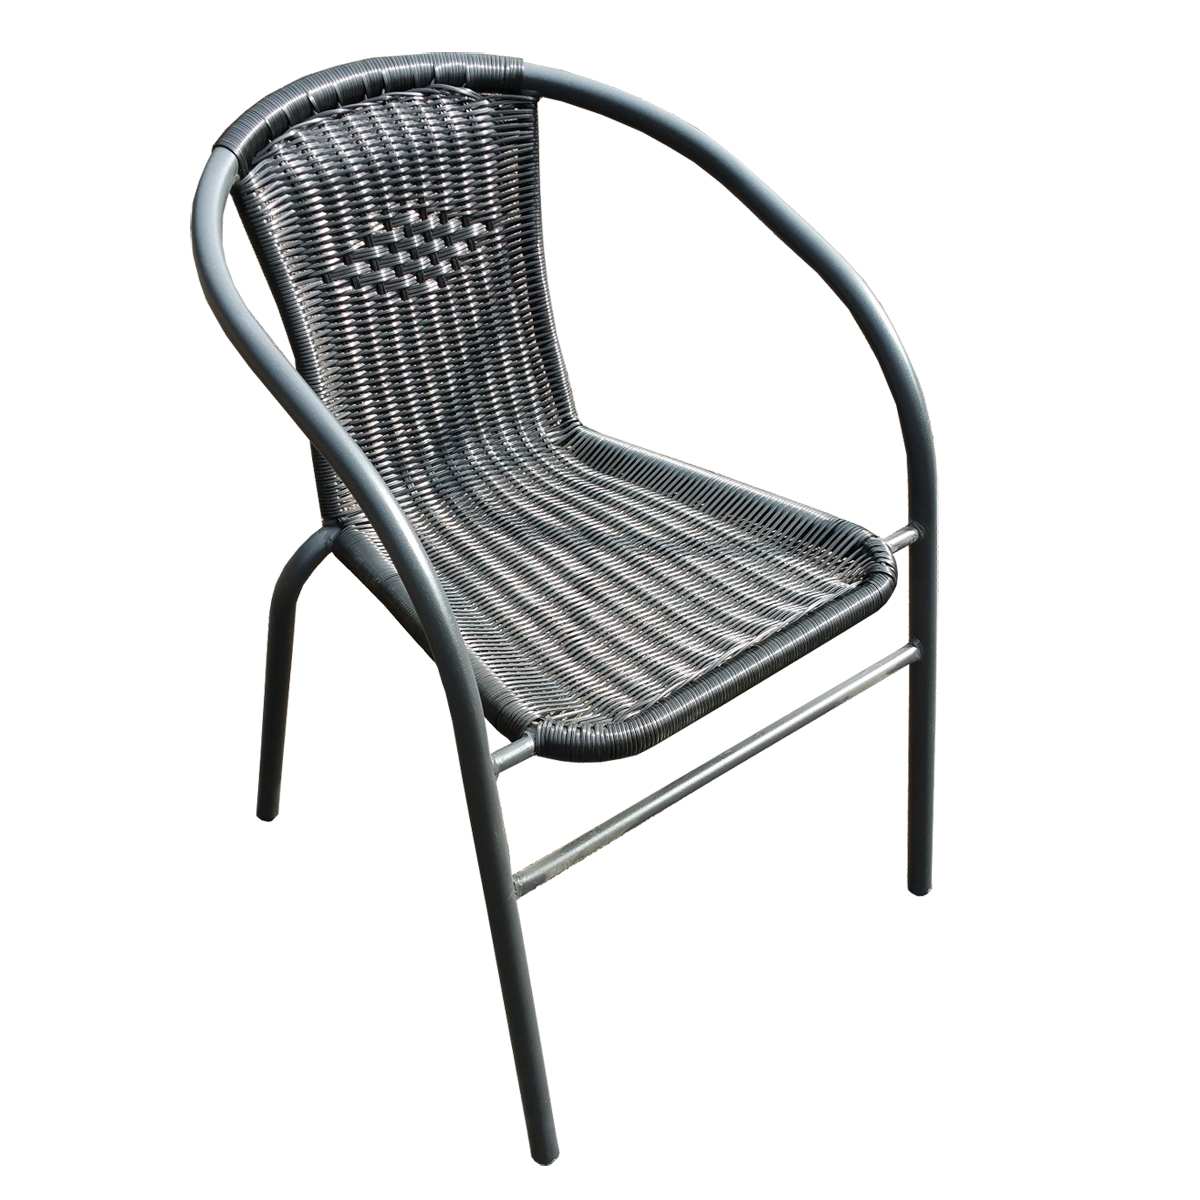 polyrattan stuhl mardin schwarz outdoor st hle outdoor ingastro restaurant m bel direkt. Black Bedroom Furniture Sets. Home Design Ideas